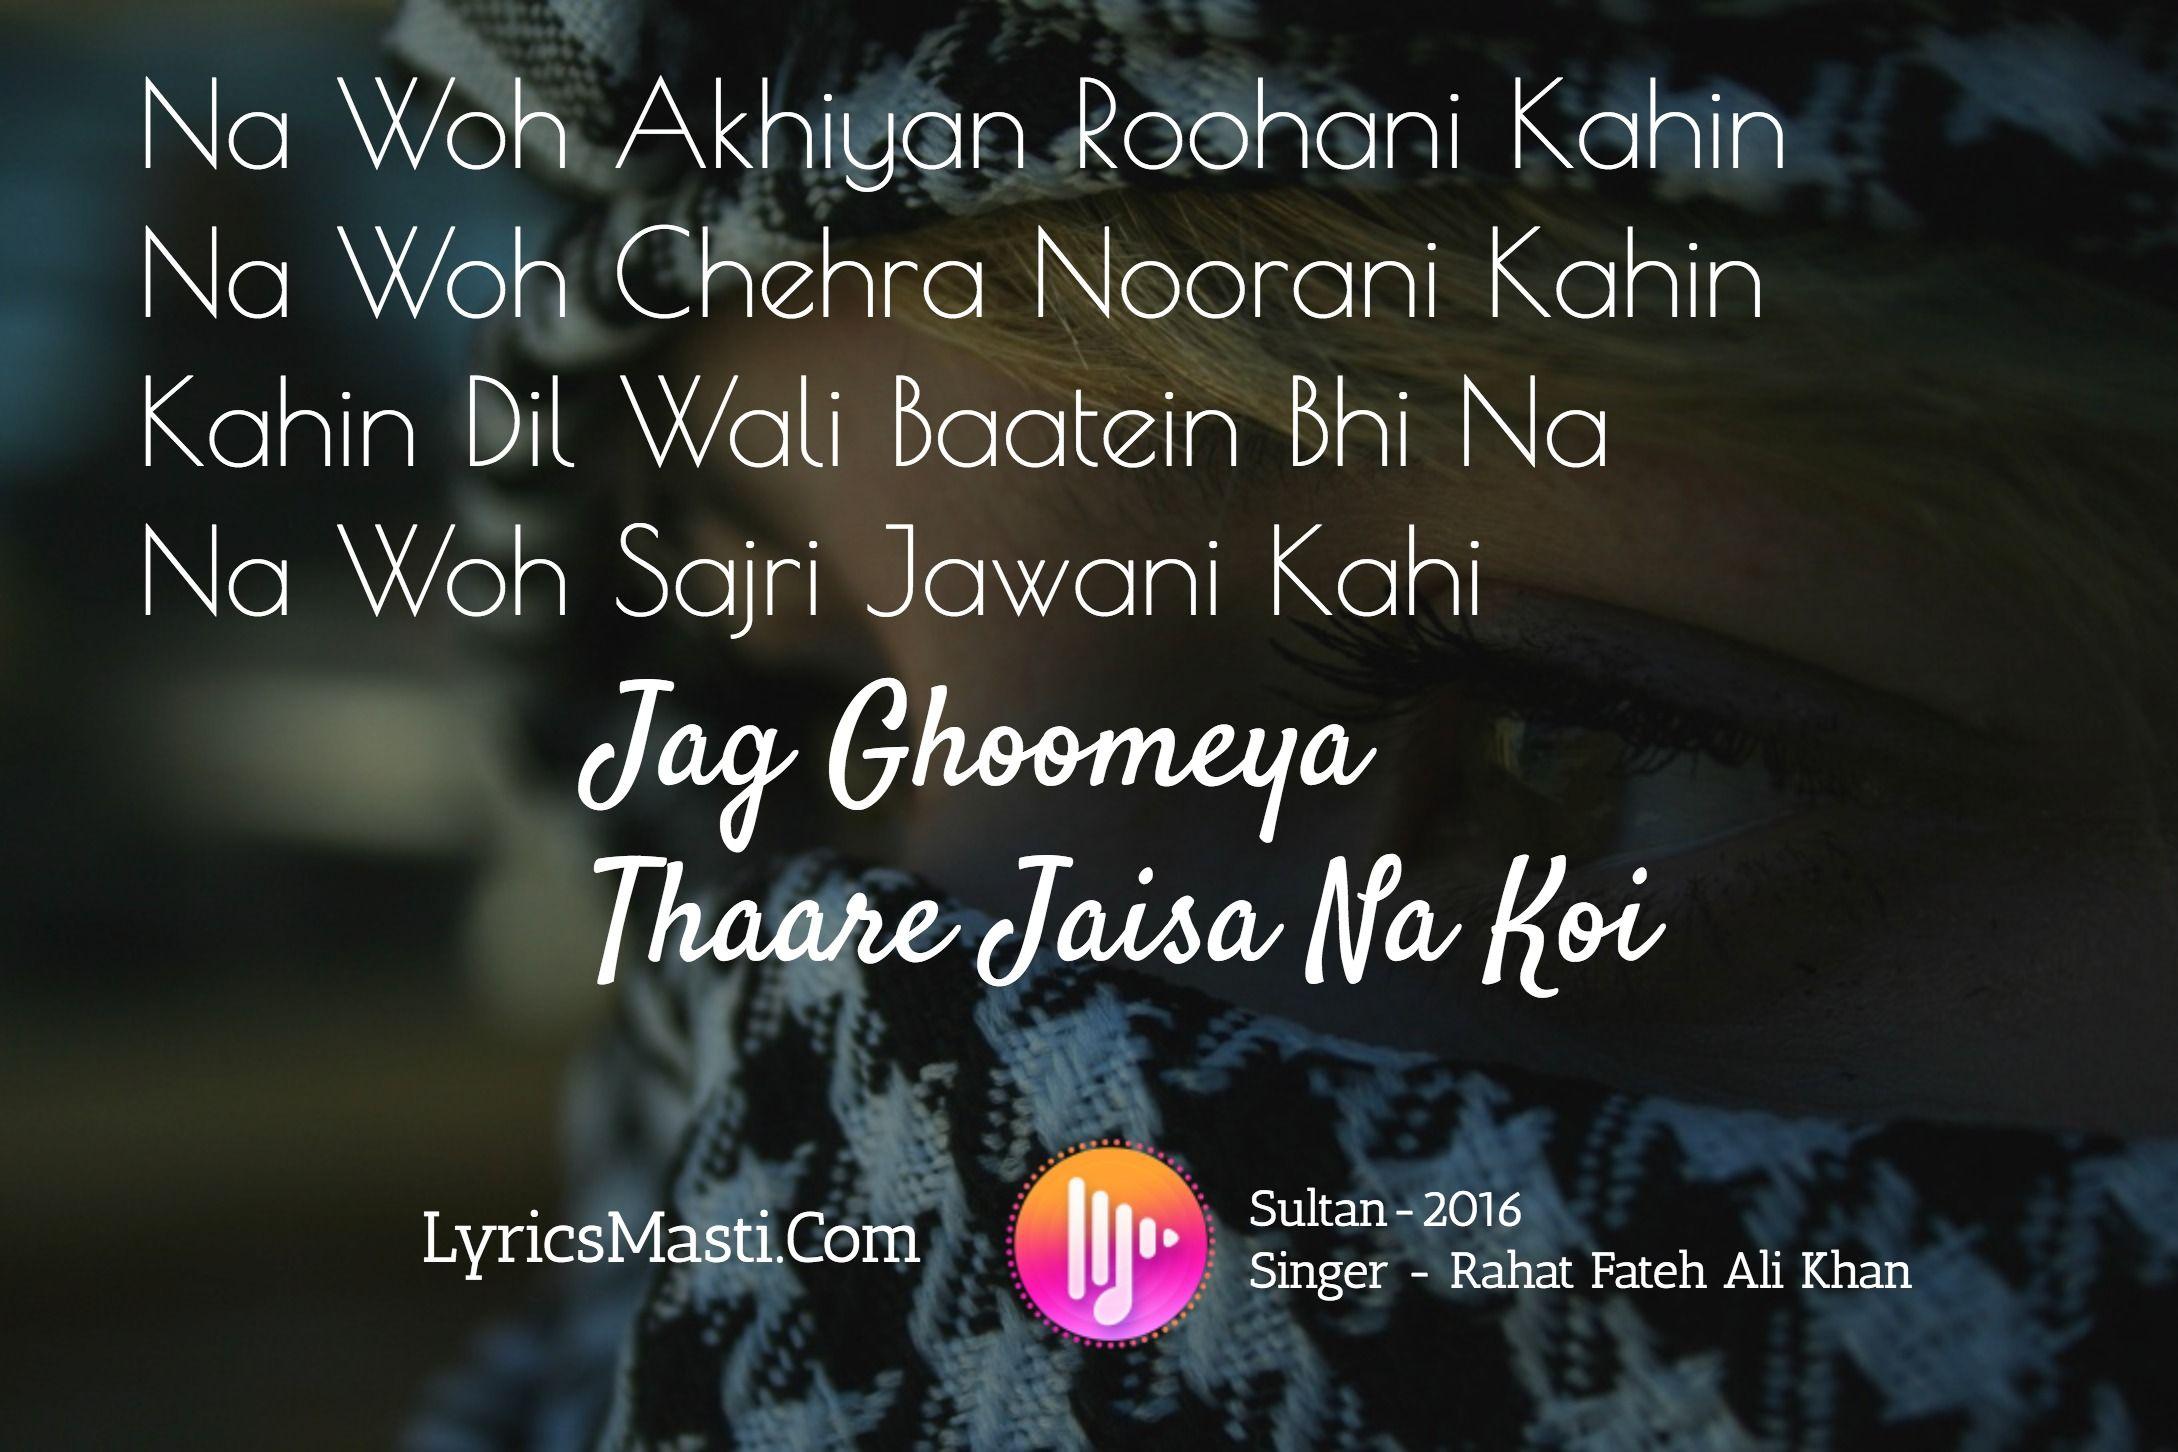 Na Woh Akhiyan Roohani Kahin Na Woh Chehra Noorani Kahin Kahin Dil